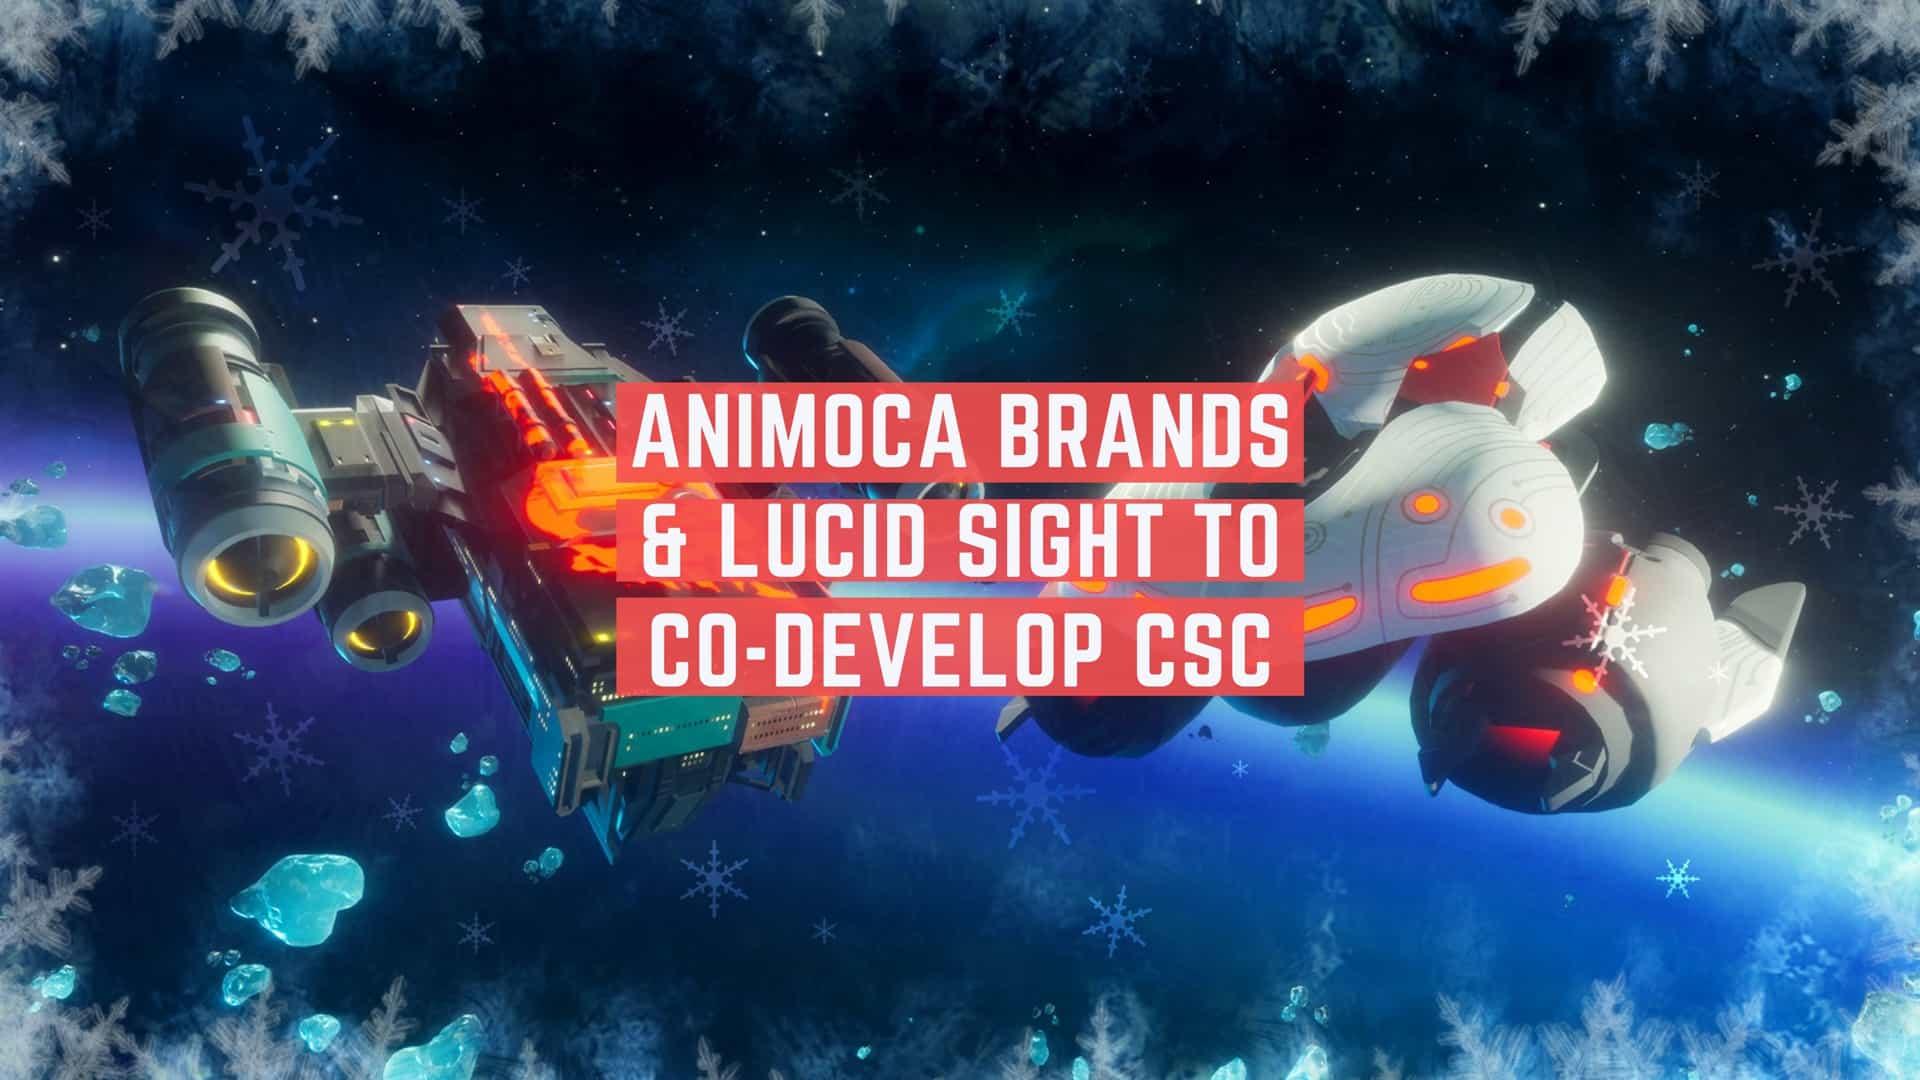 Animoca Brands & Lucid Sight CSC